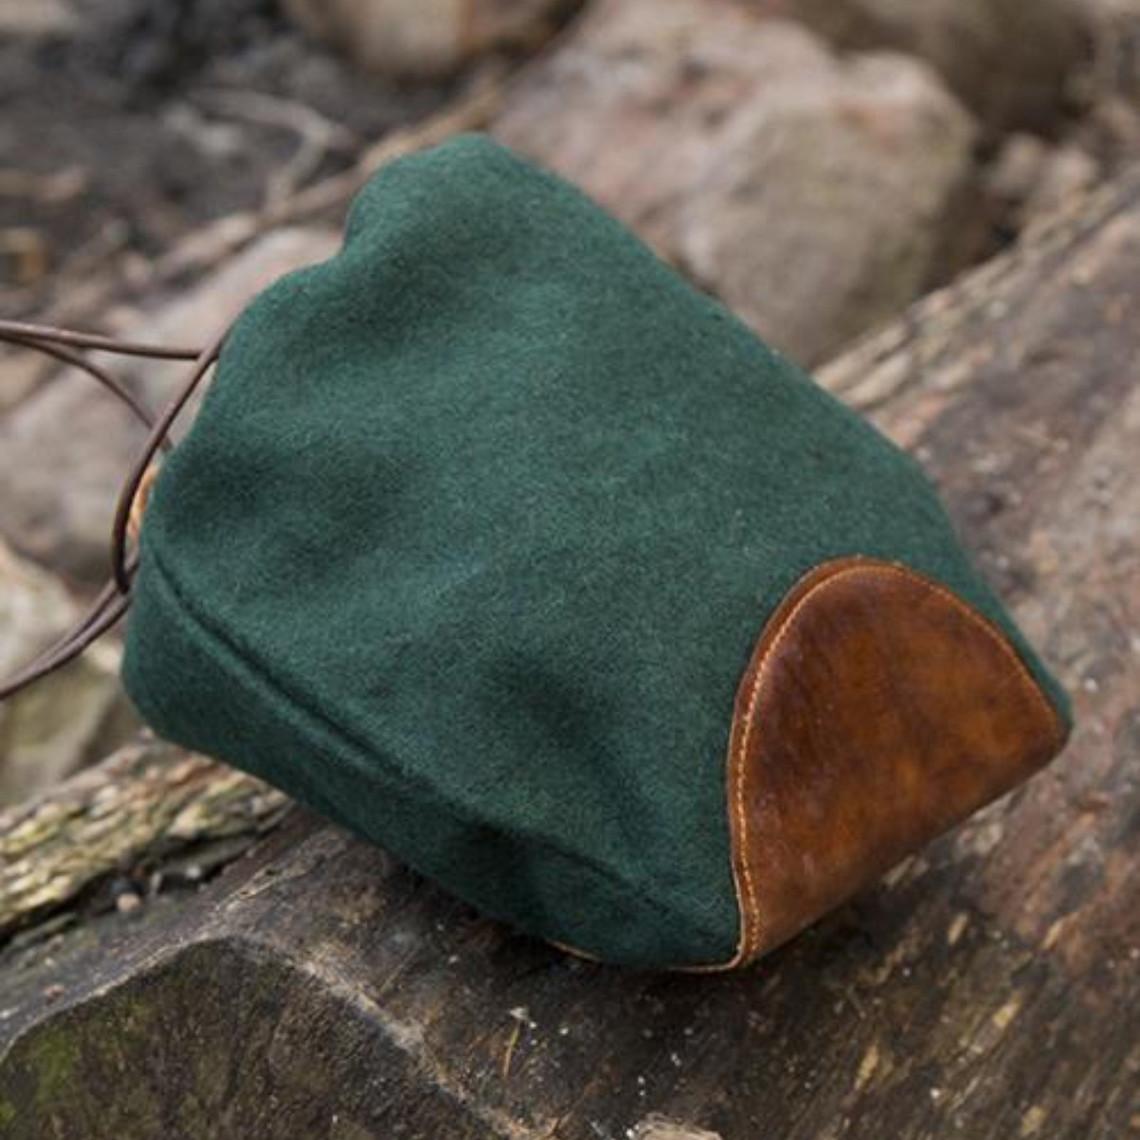 Epic Armoury Wolle-Lederbeutel, grün-braun